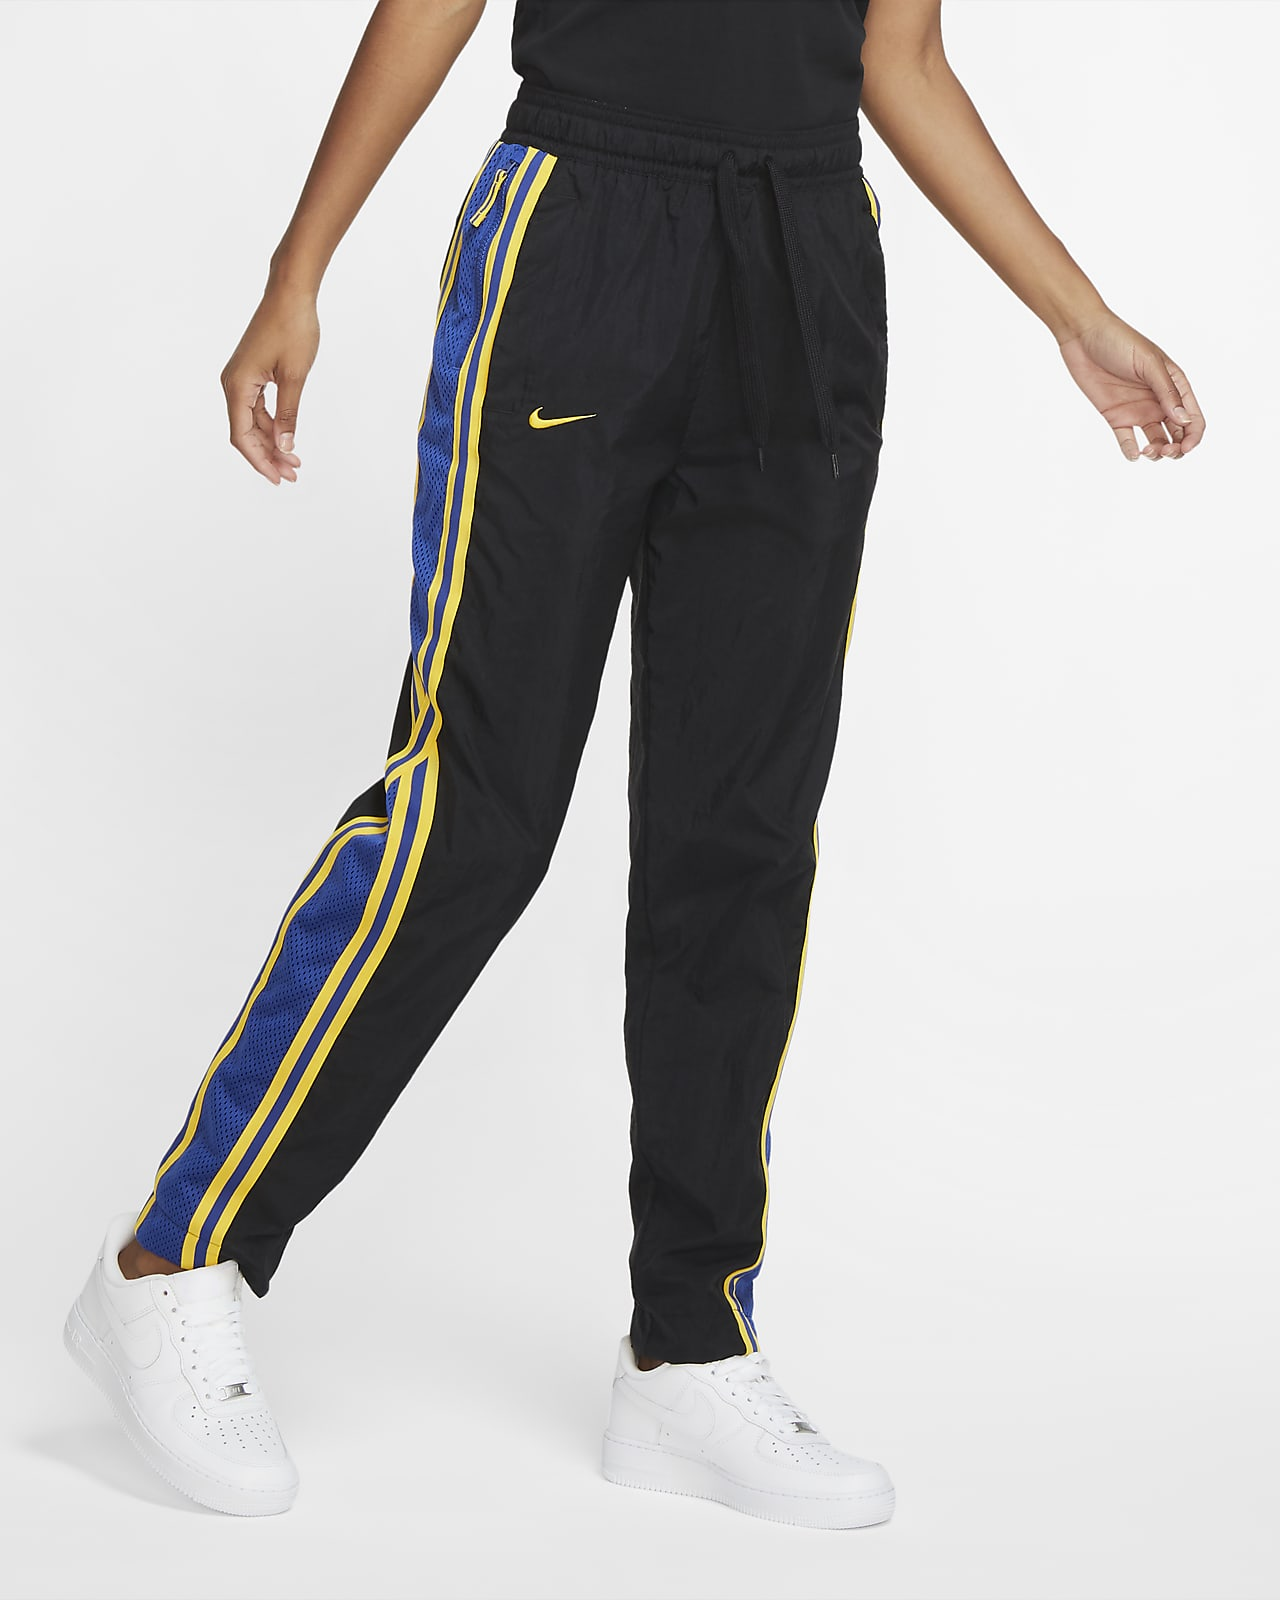 Pantalones De Conjunto De Entrenamiento Nike Nba Para Mujer Warriors Courtside Nike Com